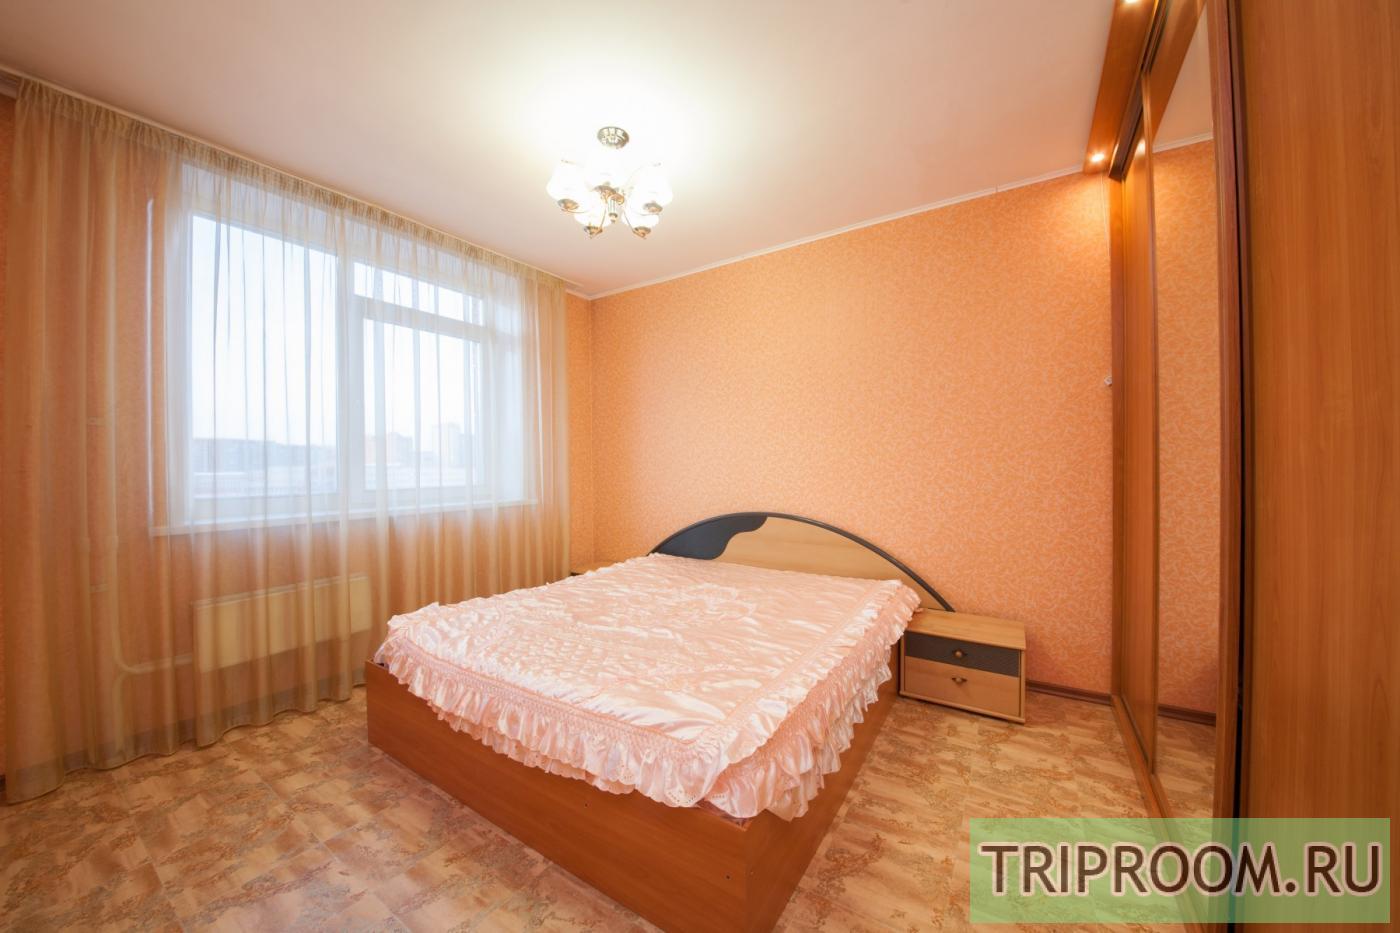 1-комнатная квартира посуточно (вариант № 35185), ул. Алексеева улица, фото № 3